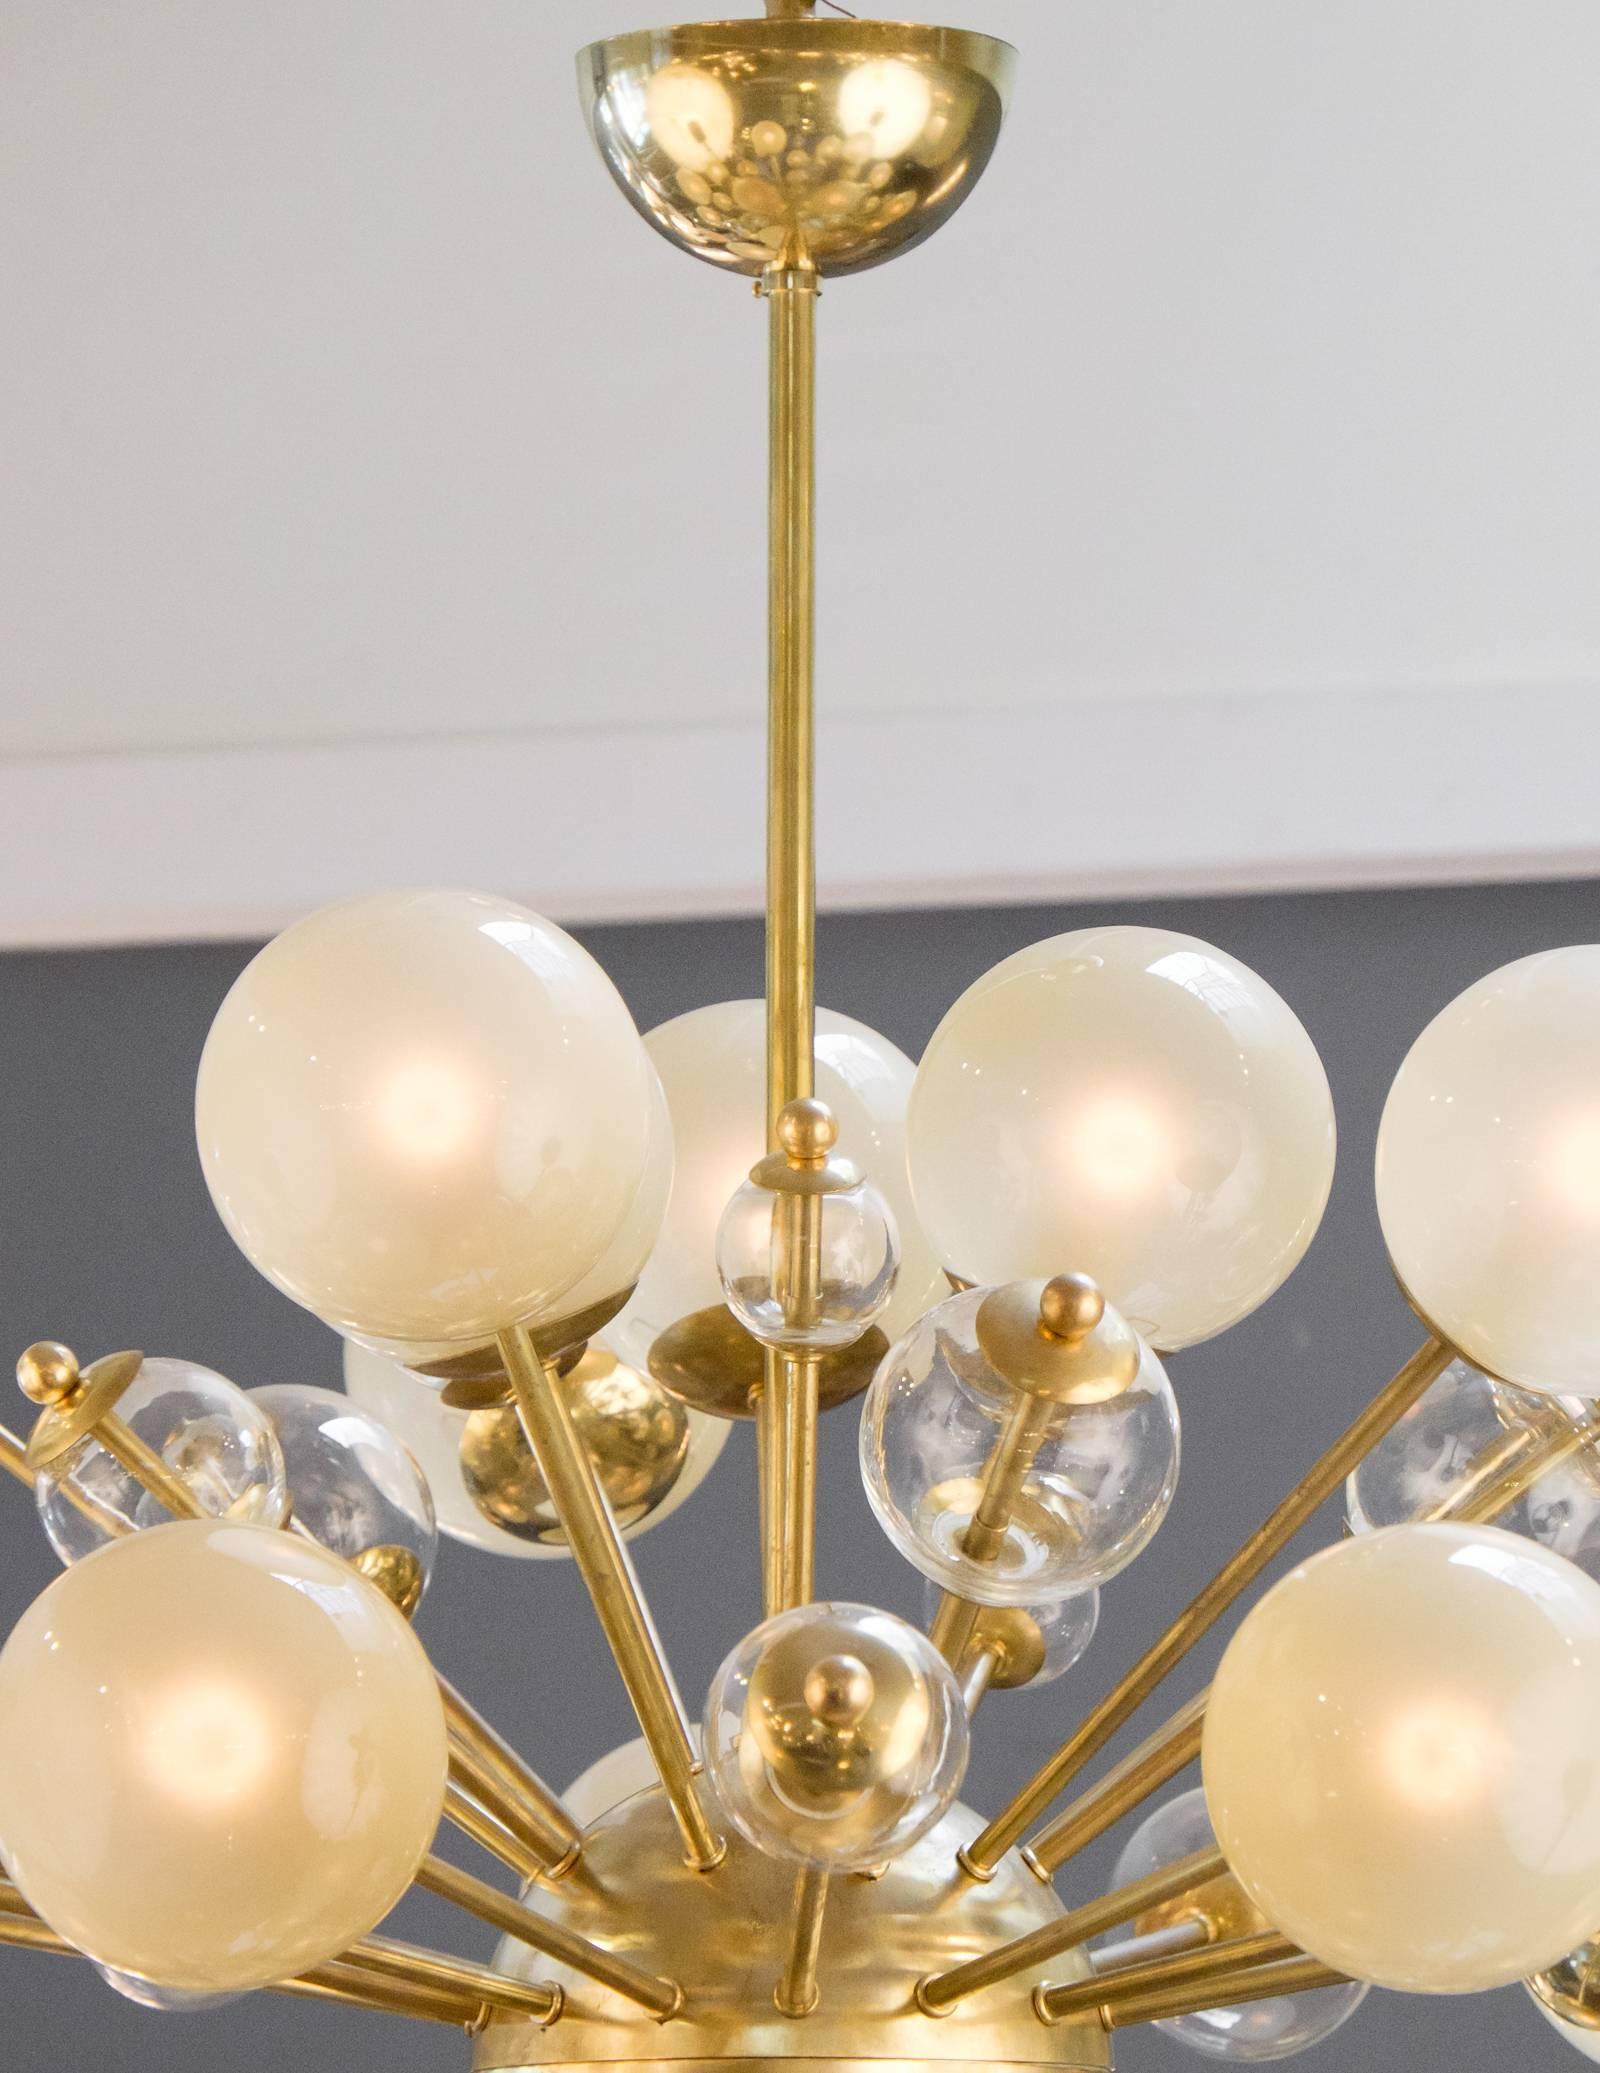 tokyo image chandelier in brass sputnik light decorative antique style